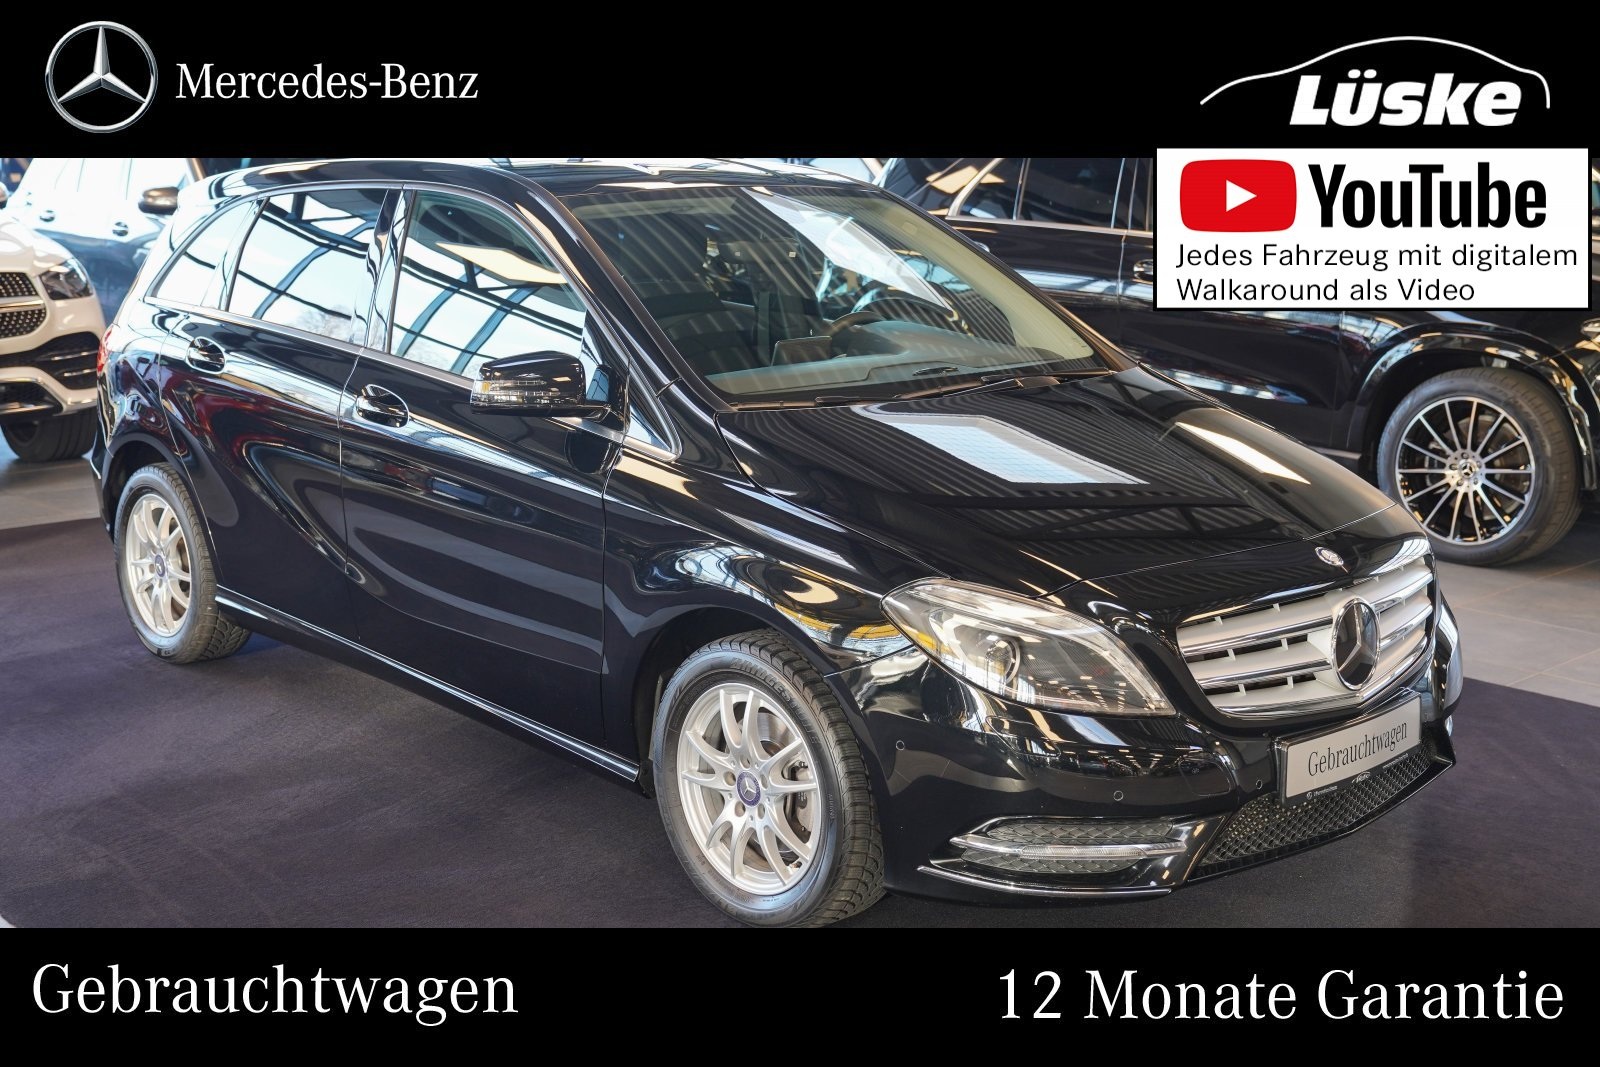 Mercedes-Benz B 200 Chrom-Paket Bi-Xenon Klimaautomatik PTS CD, Jahr 2013, Benzin